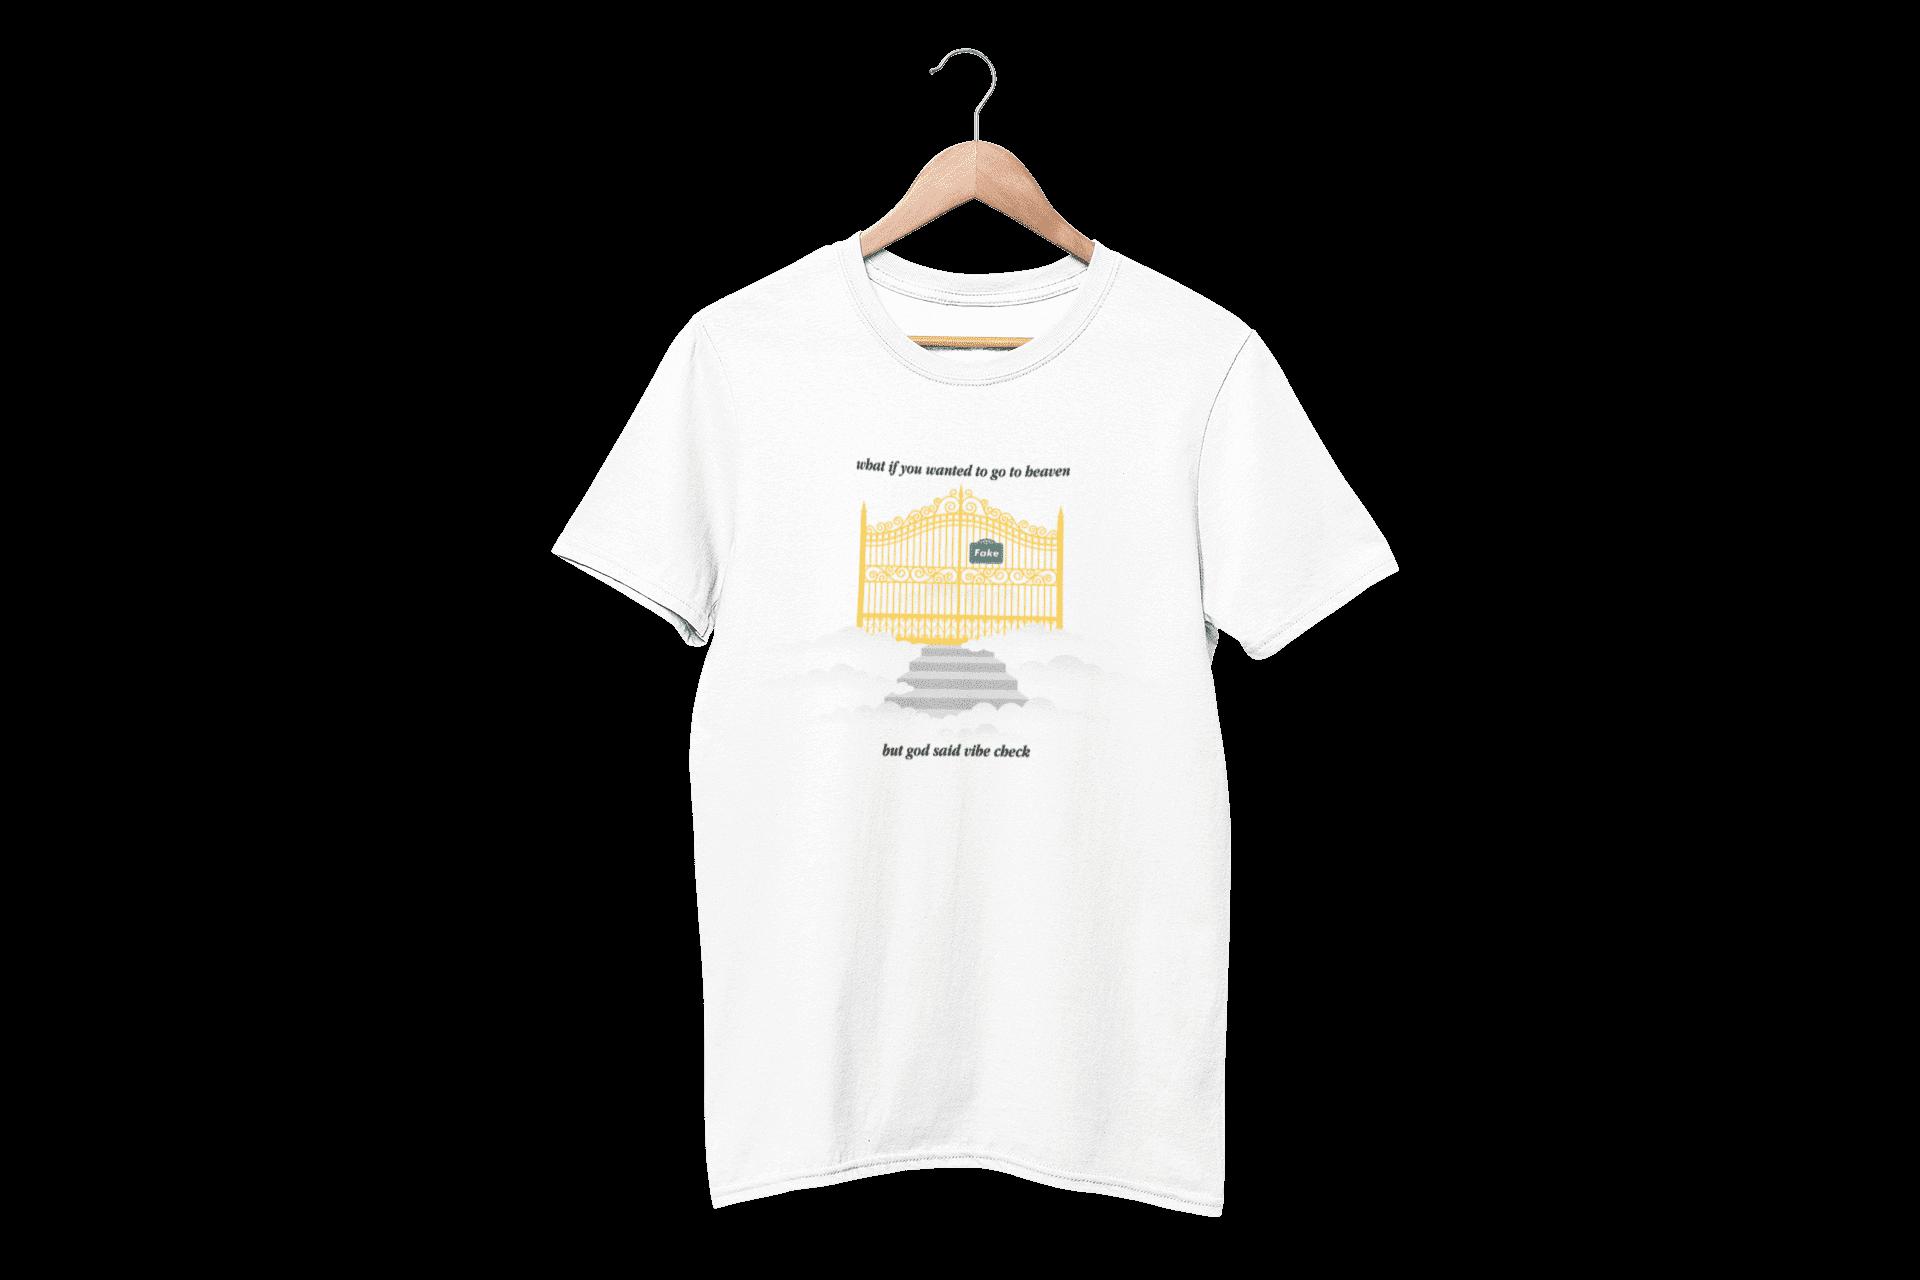 God Said Vibe Check White Half Sleeve T-Shirt